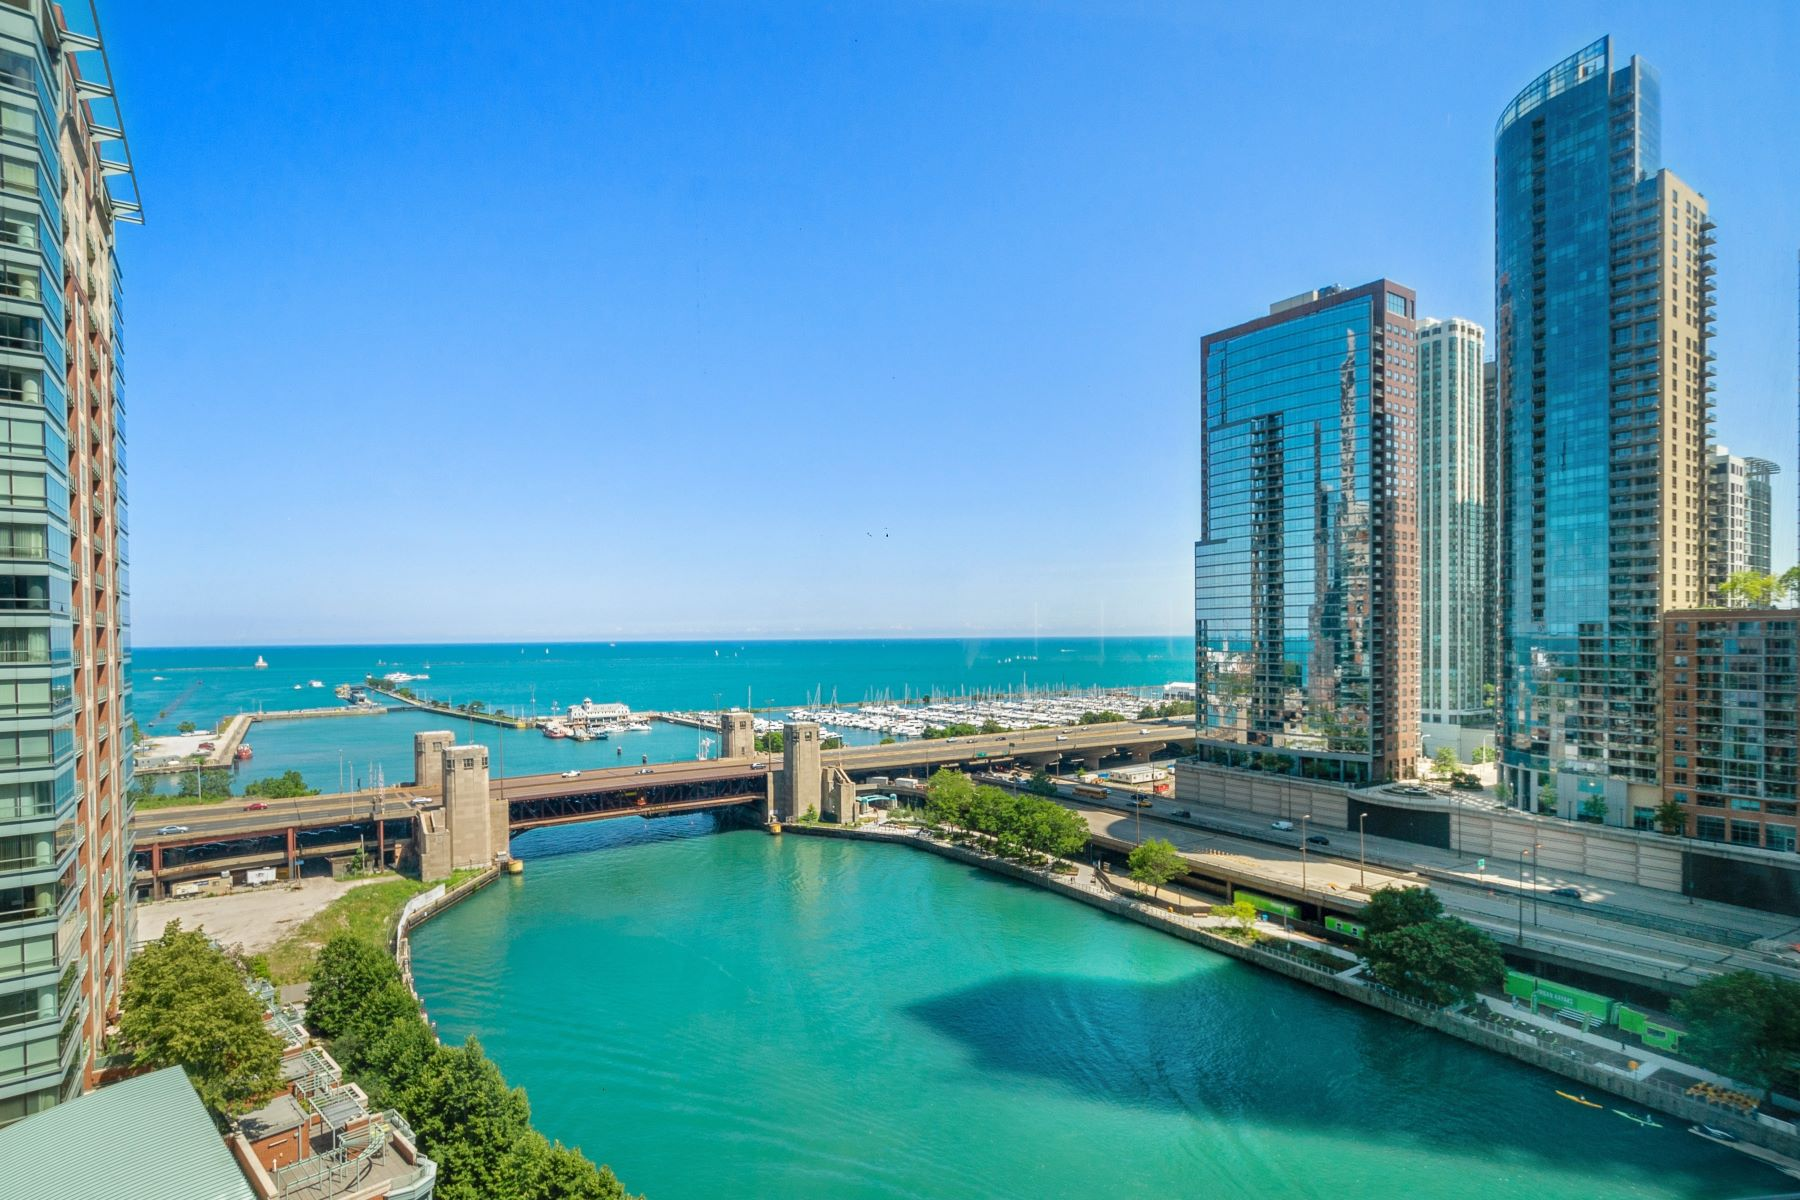 Condominiums 为 销售 在 Premier Streeterville Condo with Commanding Views 415 E North Water Street Unit 1605 芝加哥, 伊利诺斯州 60611 美国